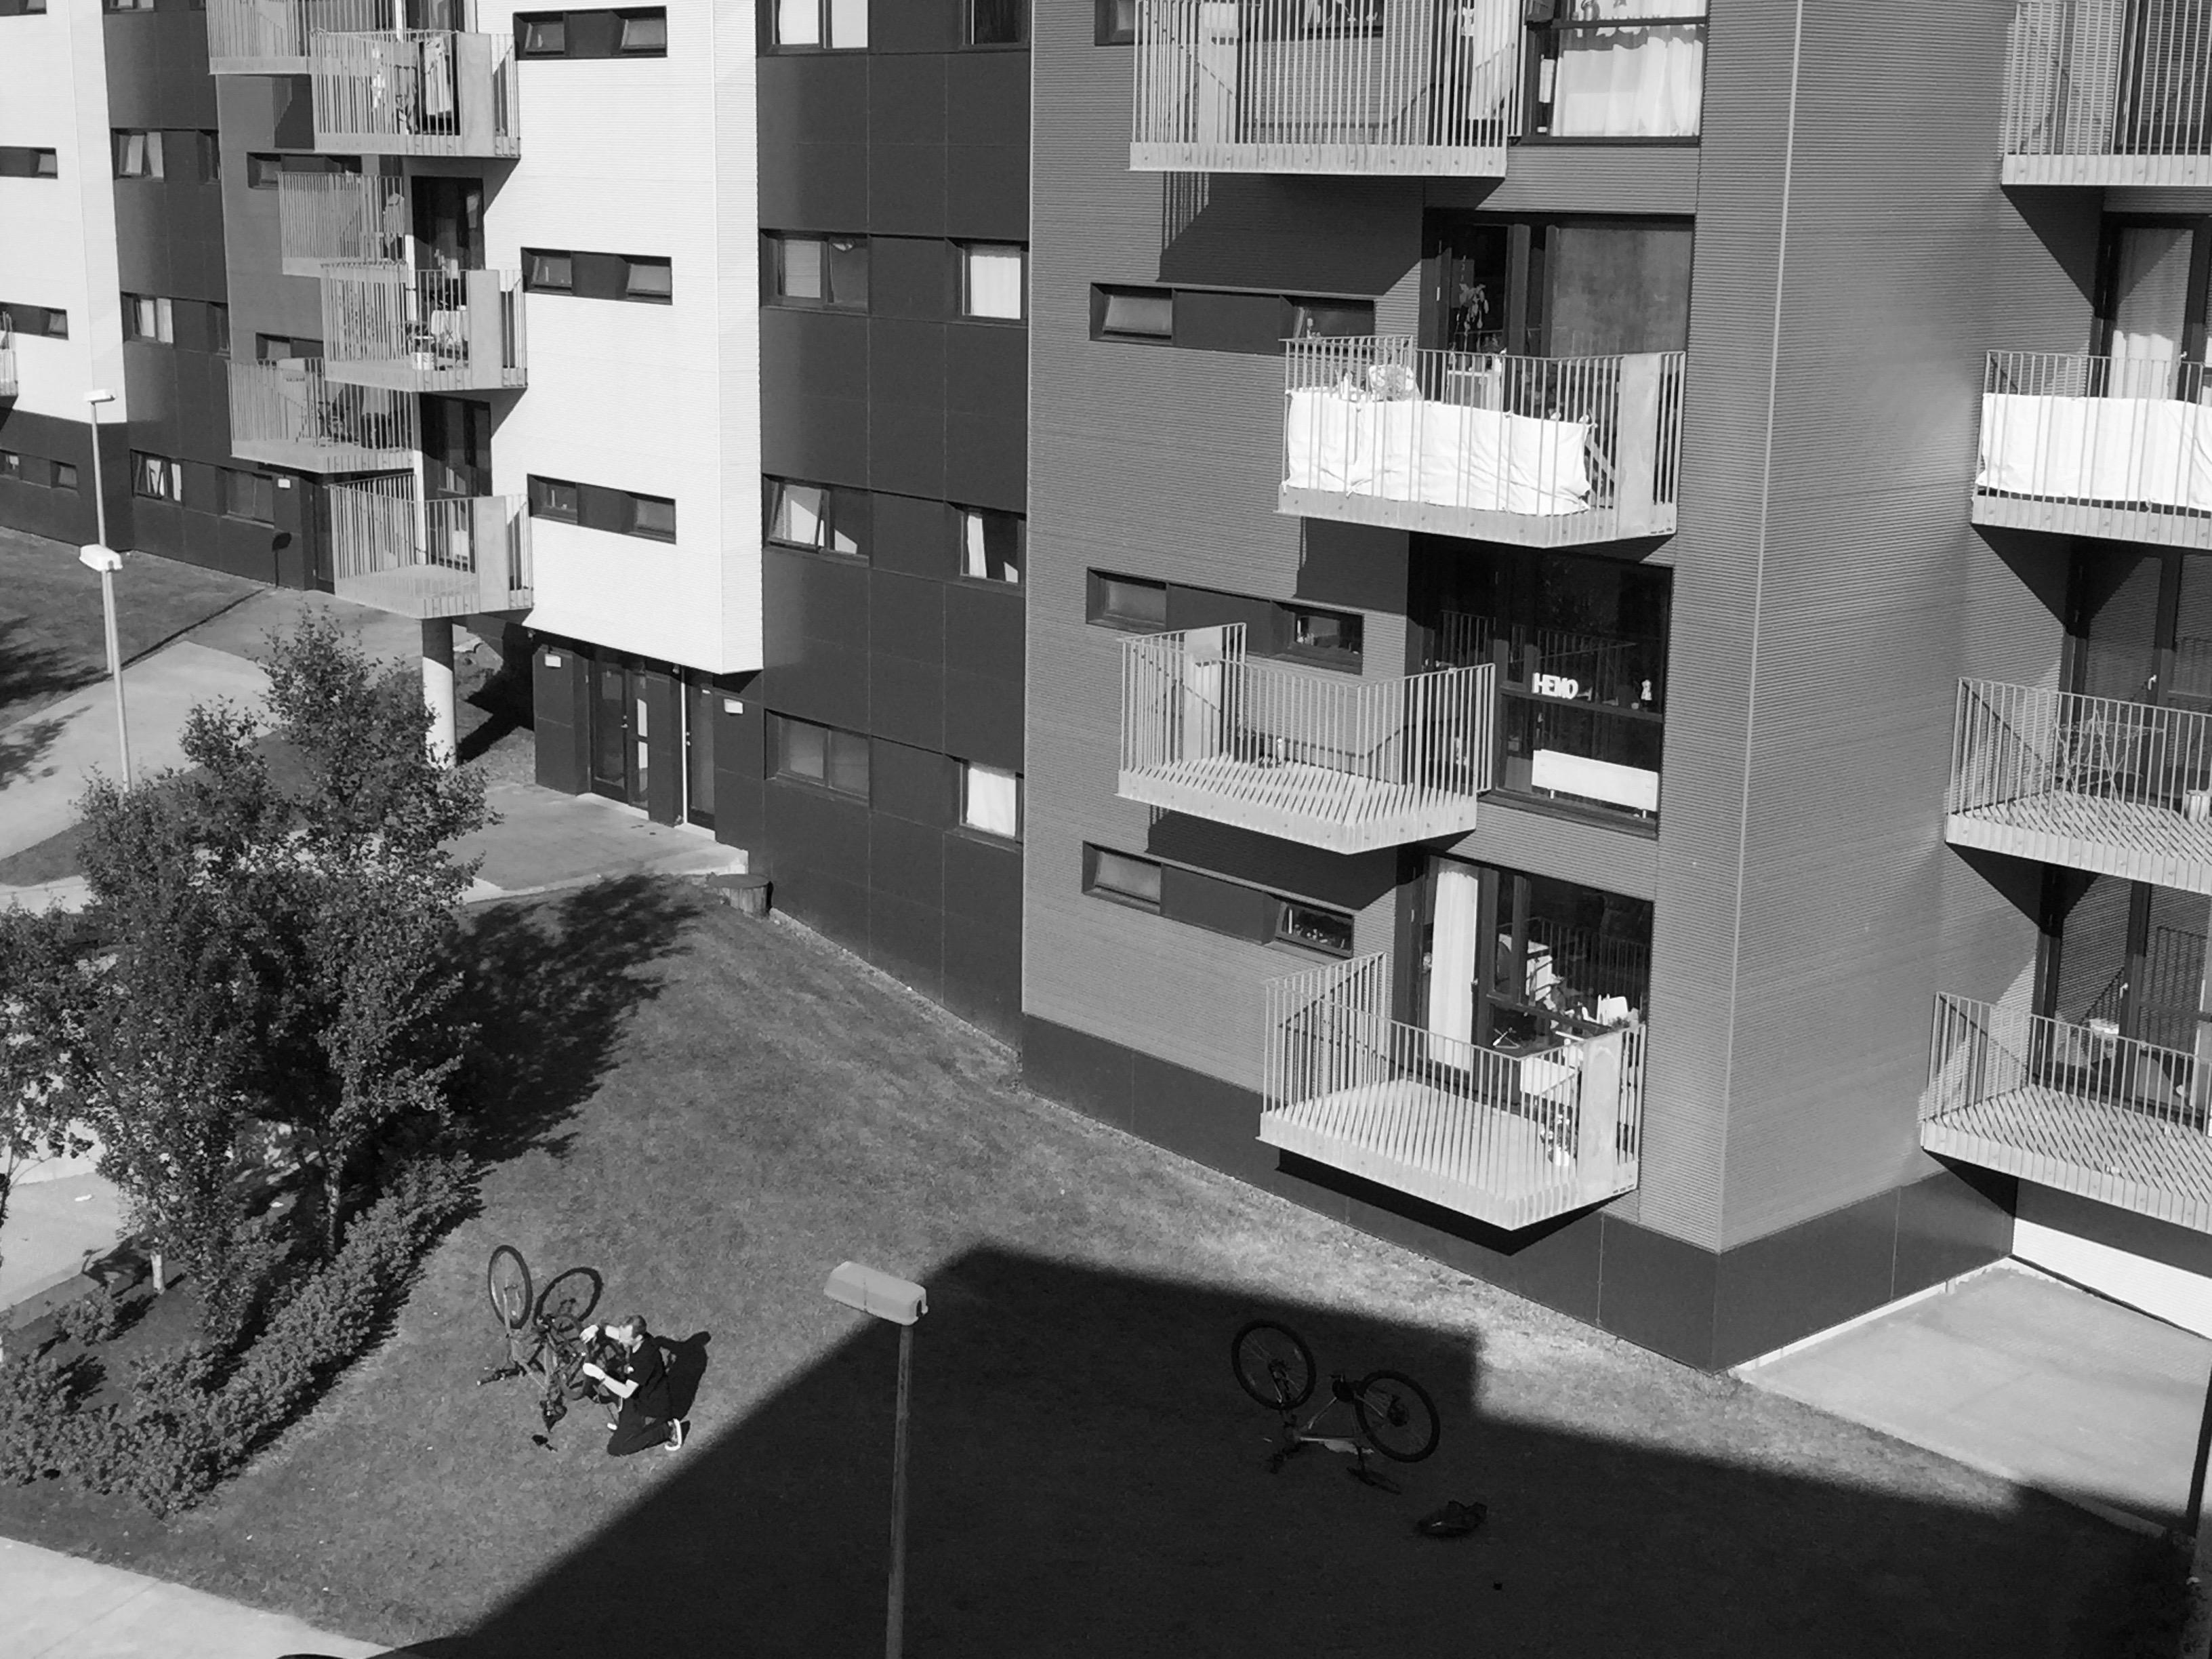 Housing Bubble Iceland comparison with Spain